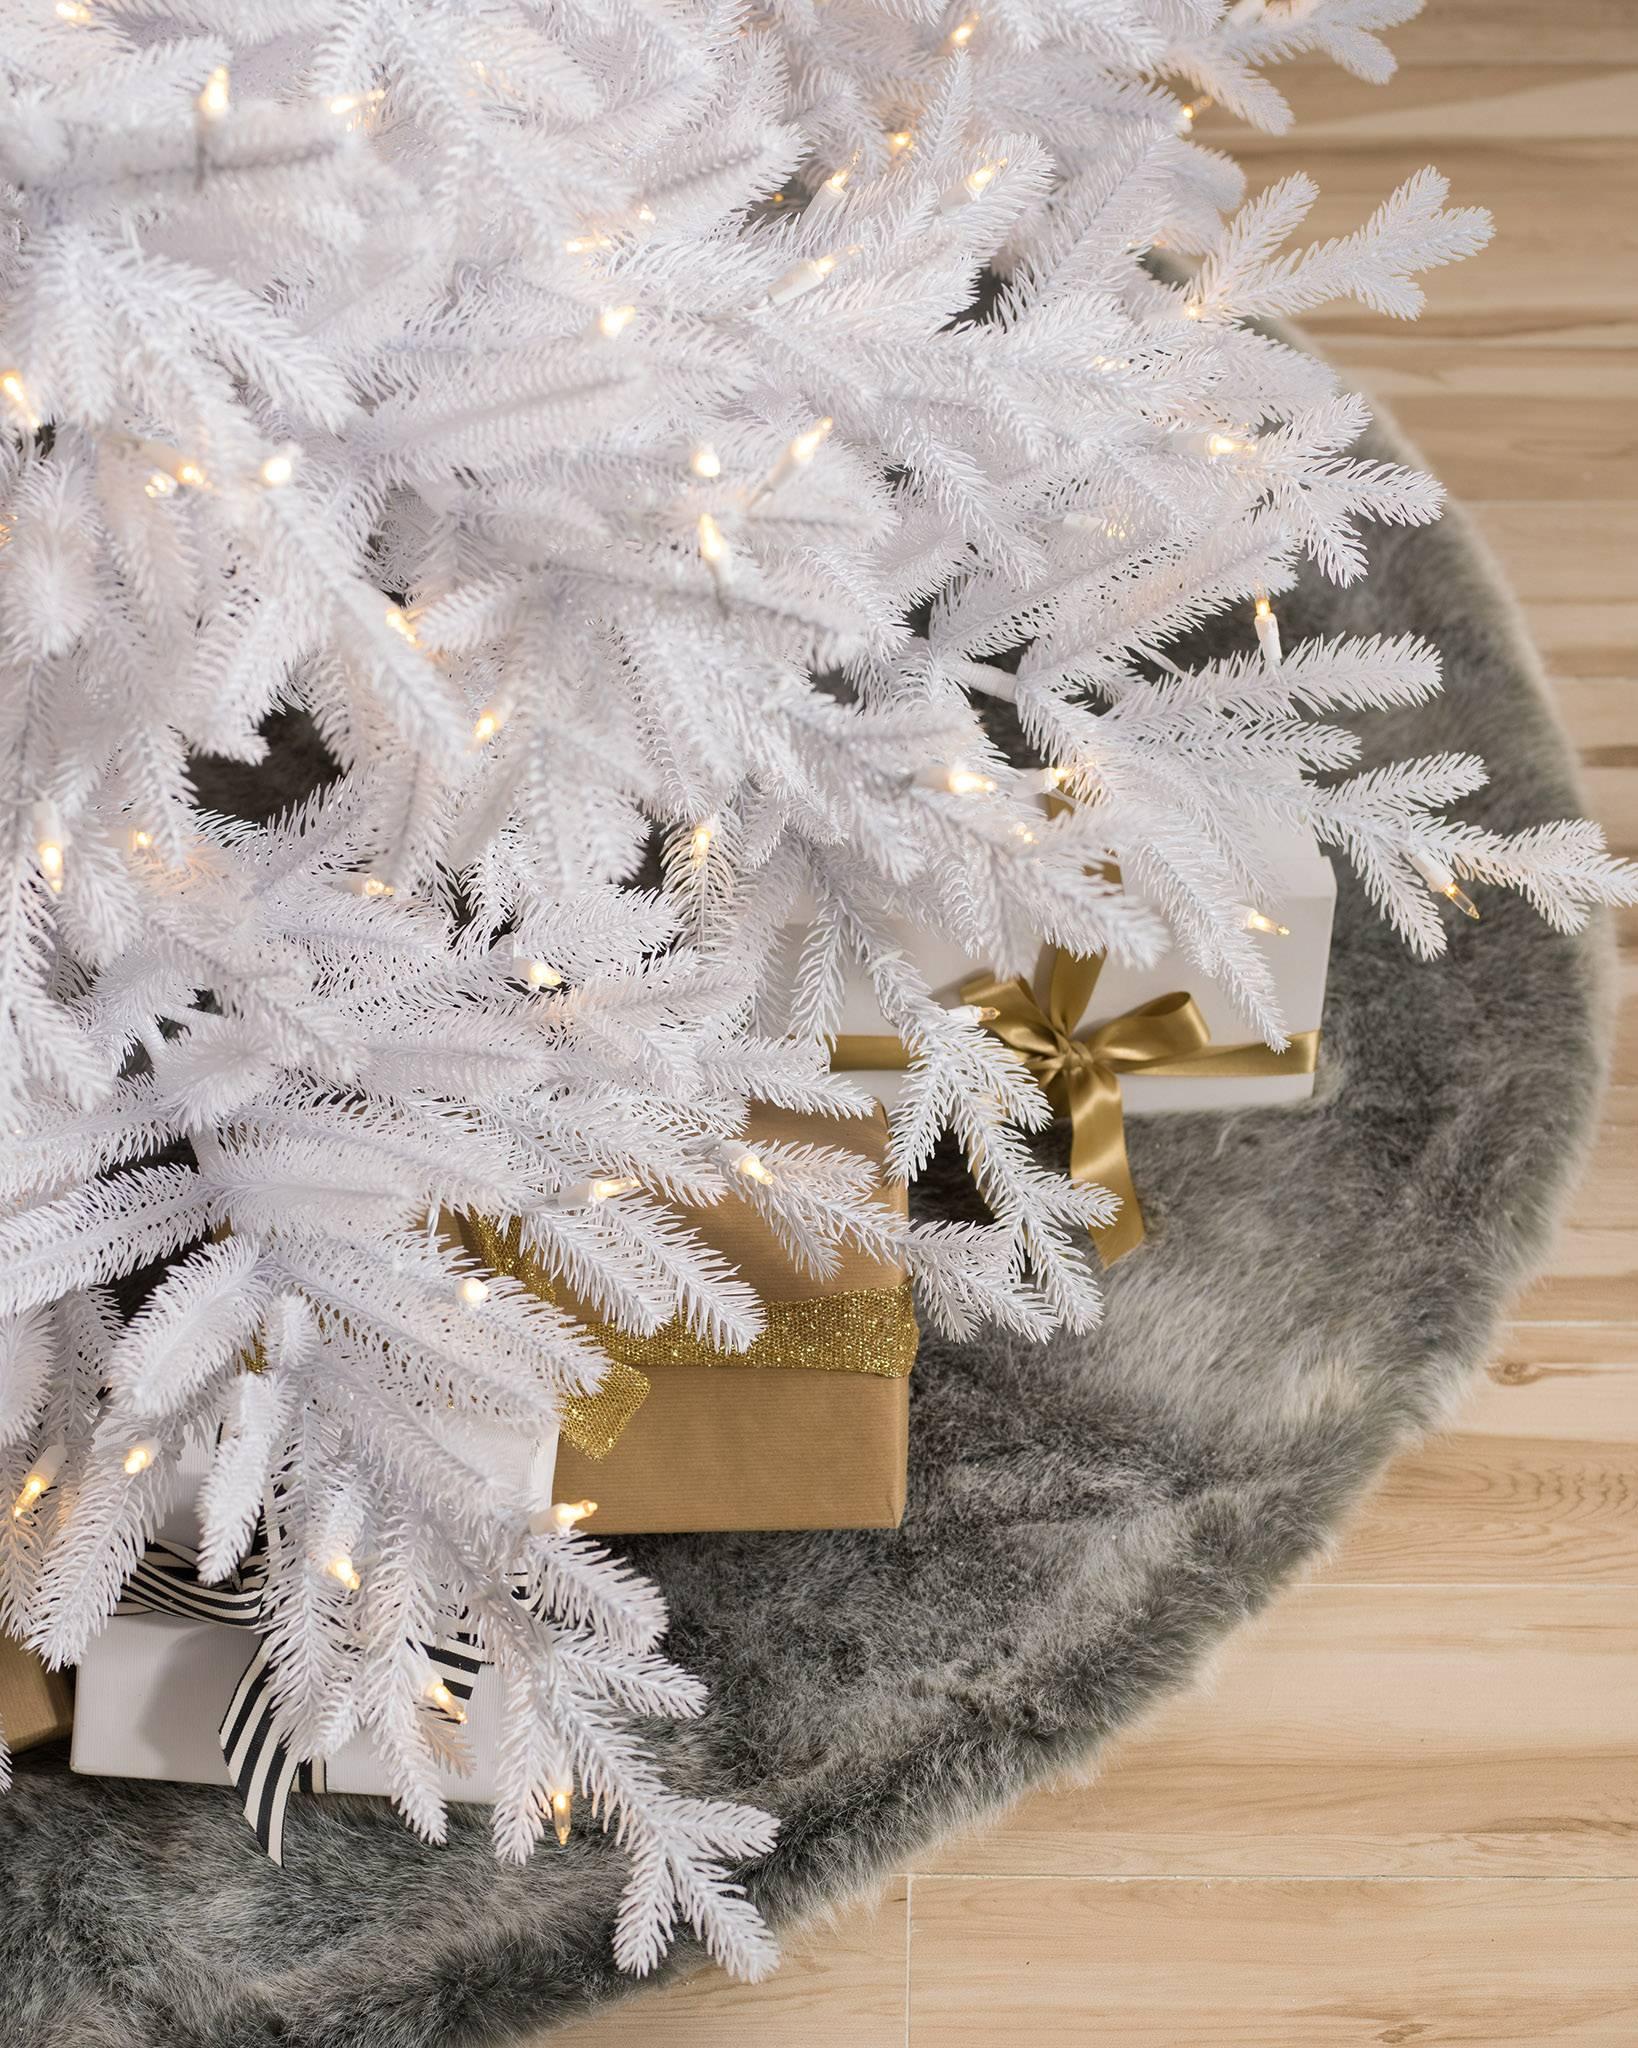 660578885c5 ... Denali White Christmas Tree by Balsam Hill ...